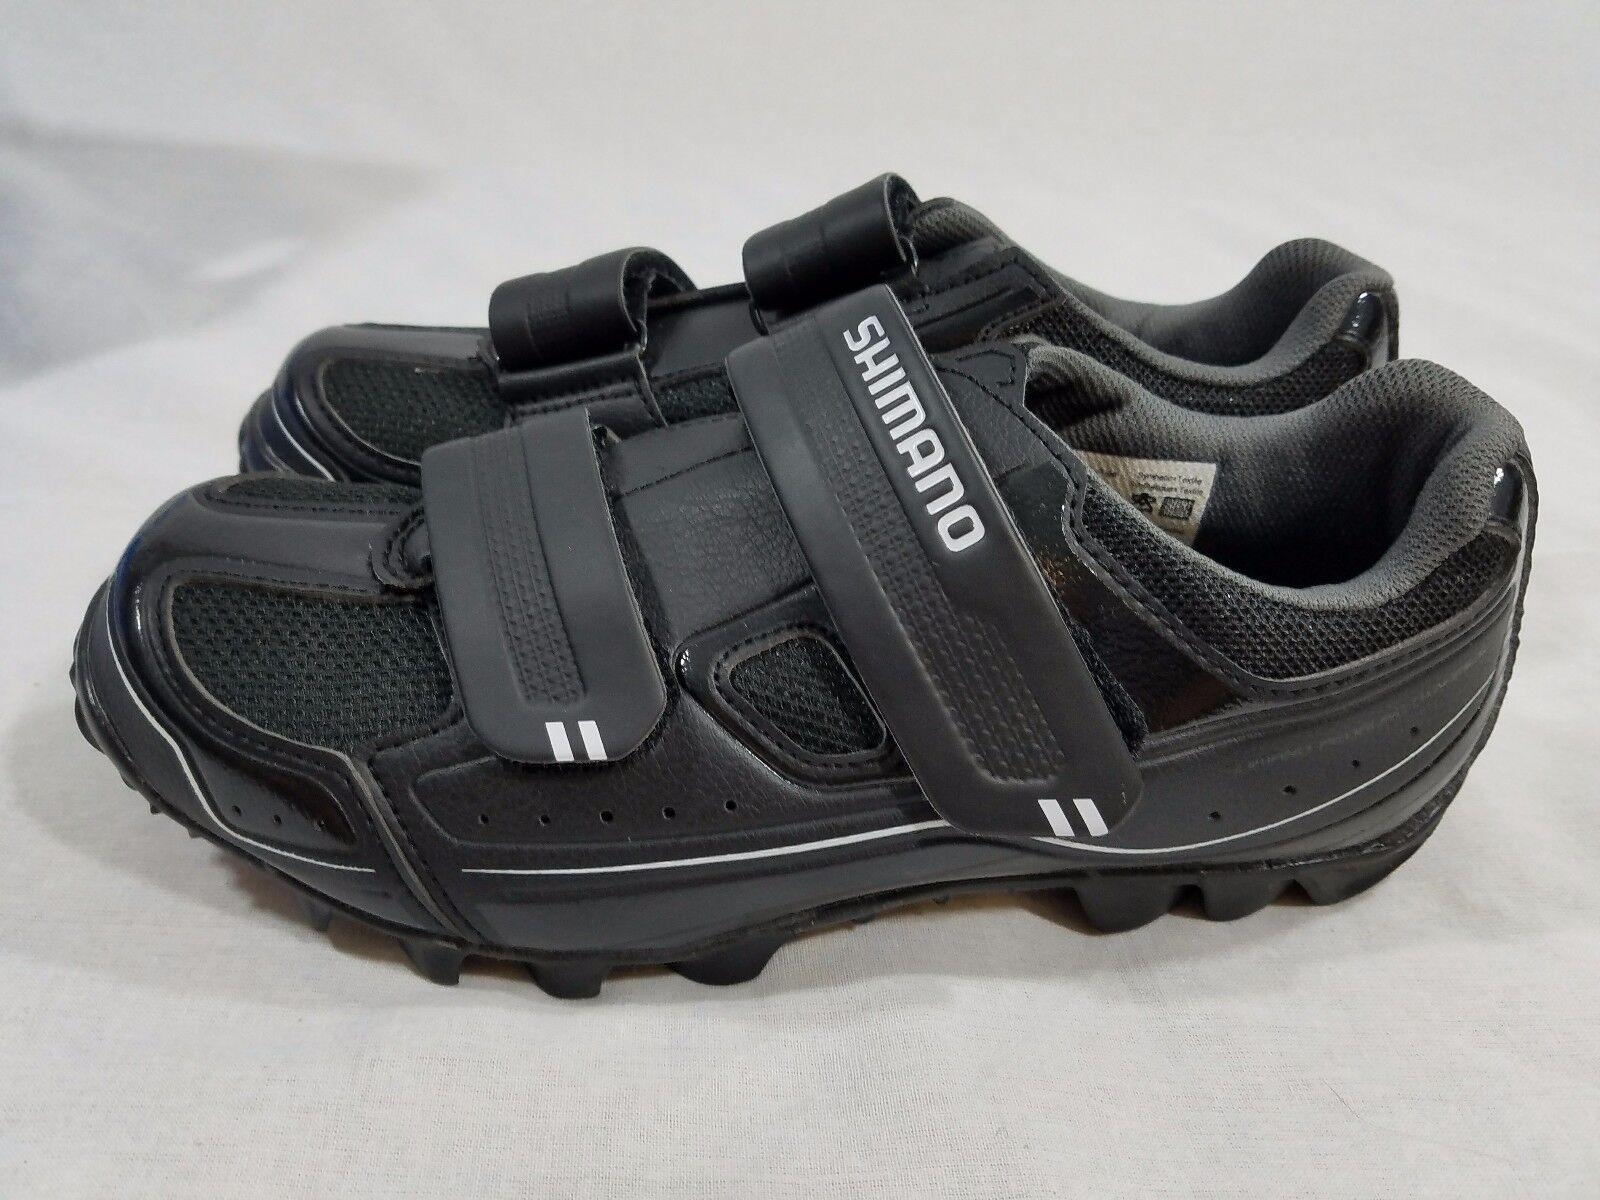 Shimano SH-M065L Men's Cycling shoes  SIZE US 5.2 1d  high quality genuine